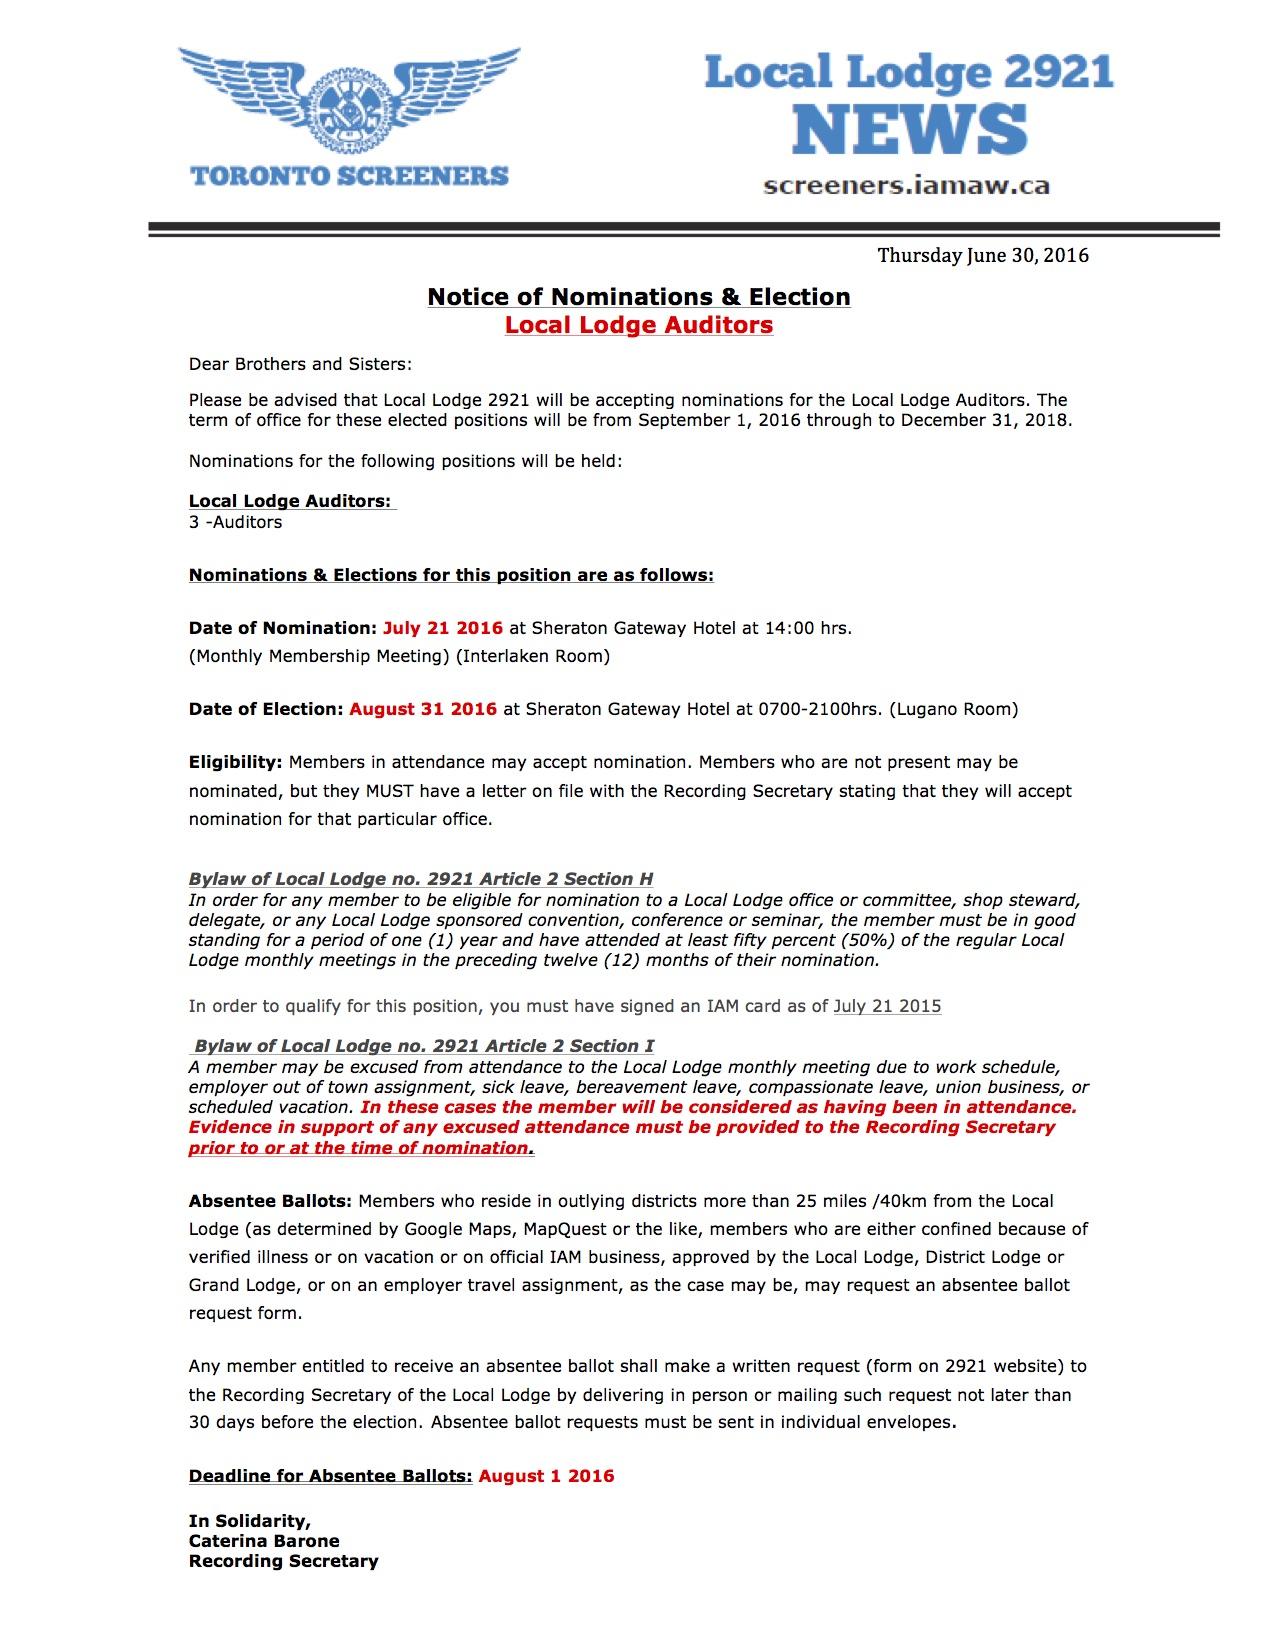 Notice-Nominations Auditor